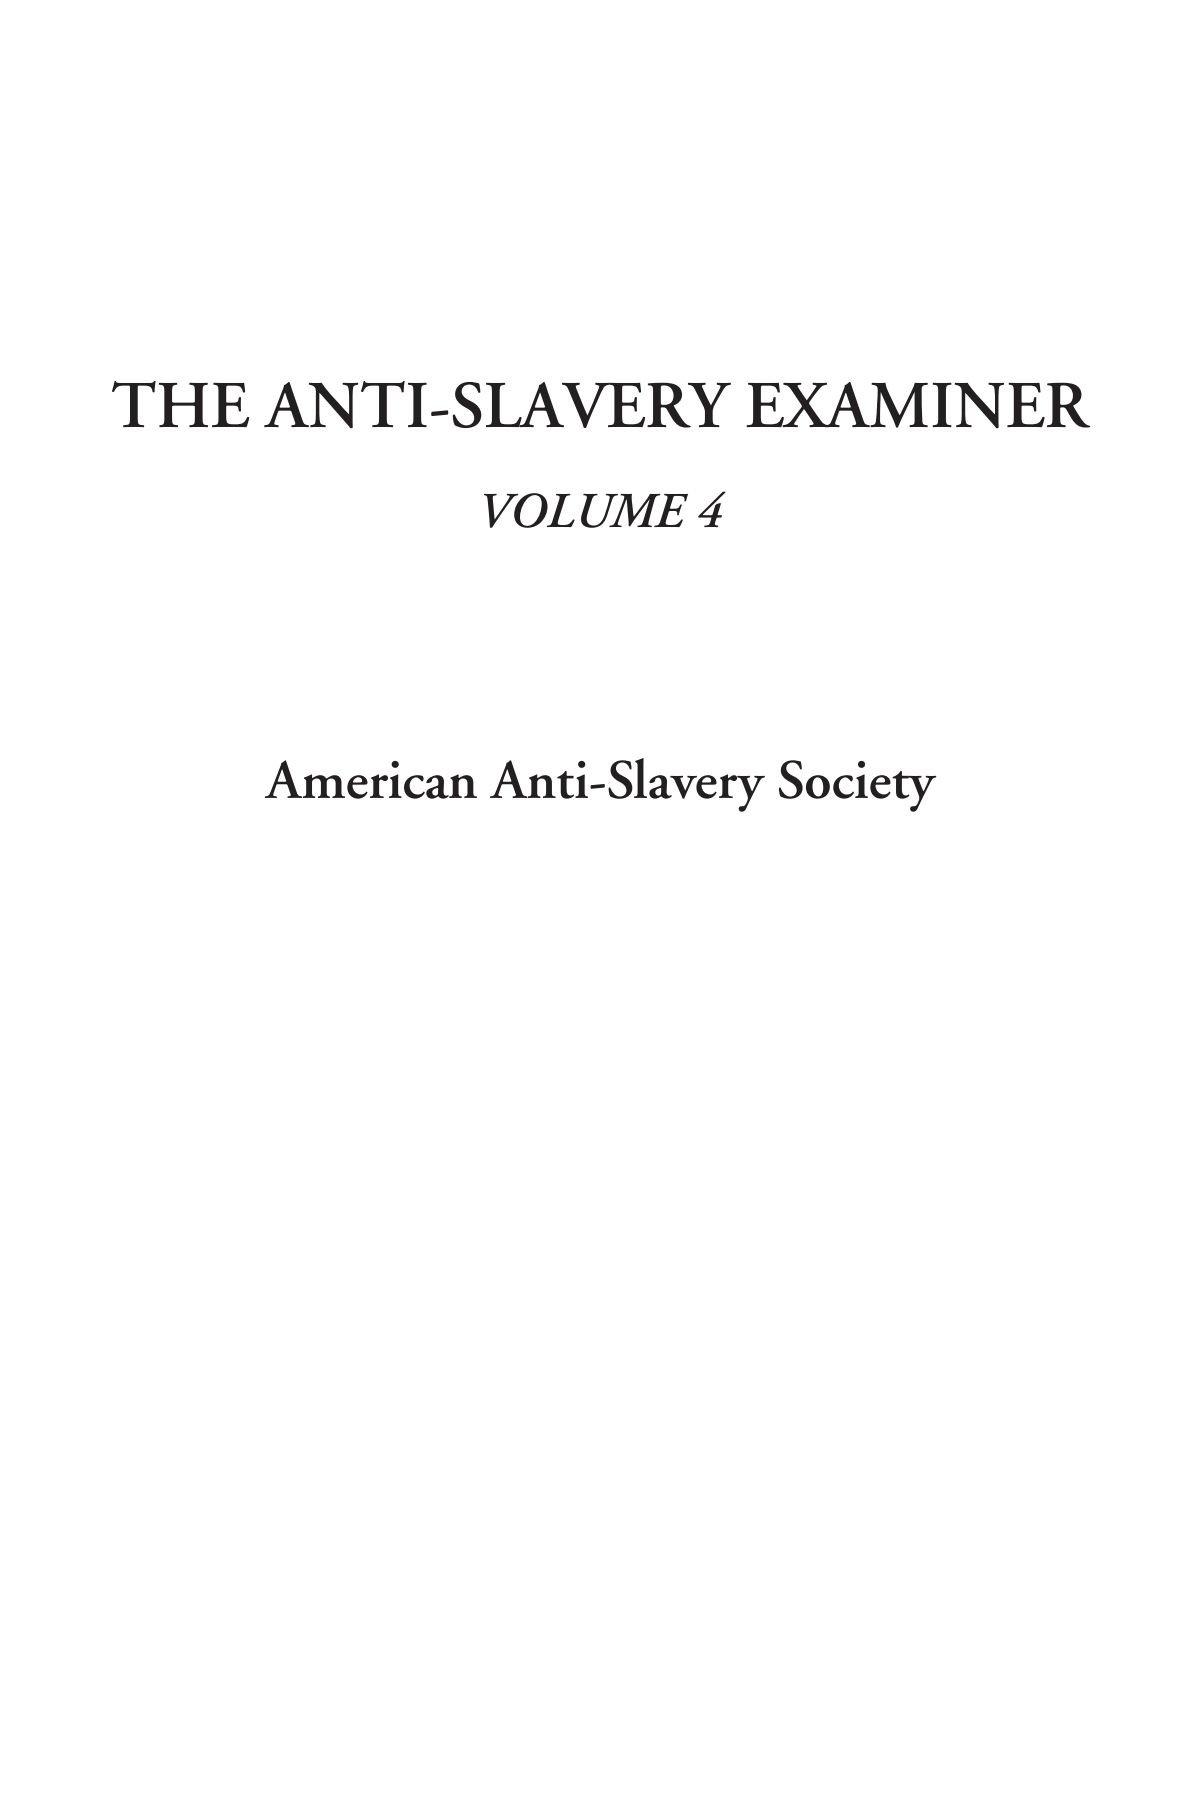 Read Online The Anti-Slavery Examiner, Volume 4 ebook